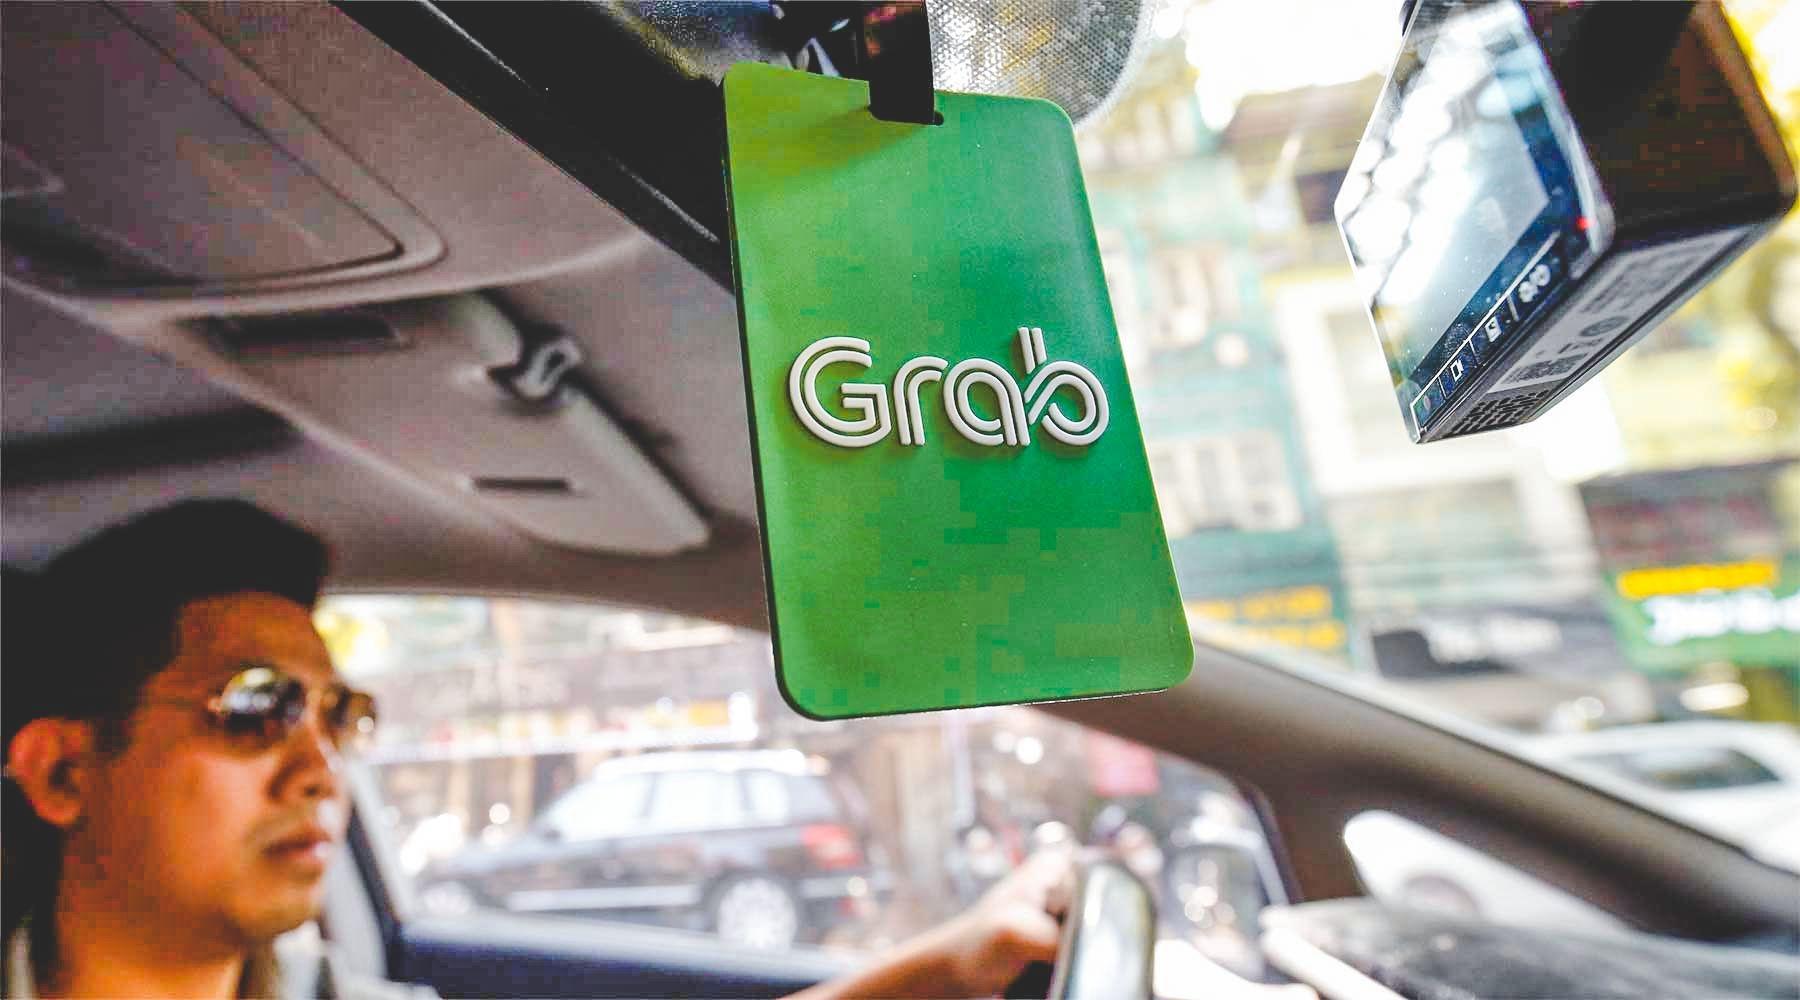 Grab's fintech platform supports SMEs in digital market